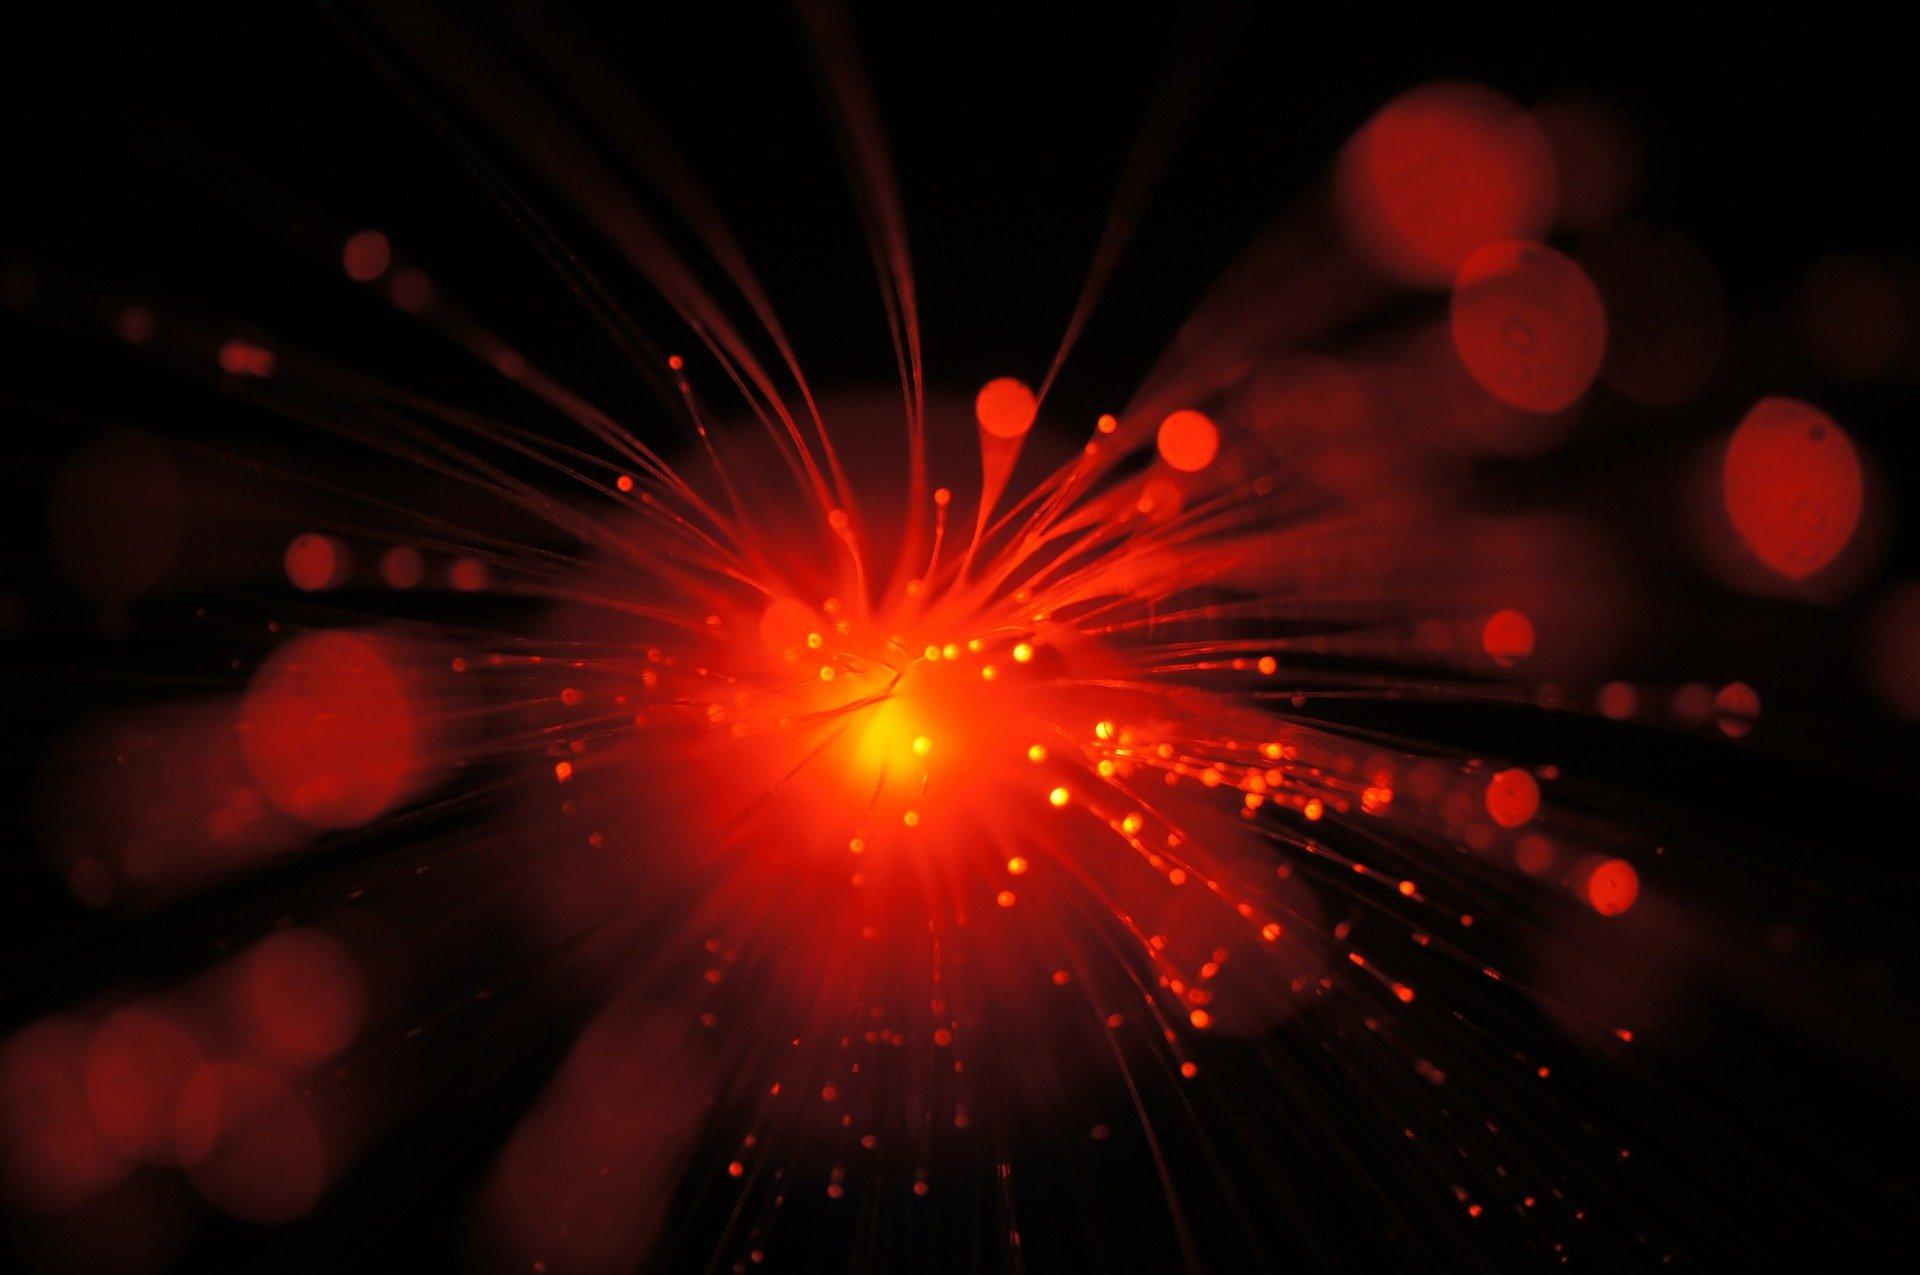 Lasers make magnets behave like fluids - Phys.org